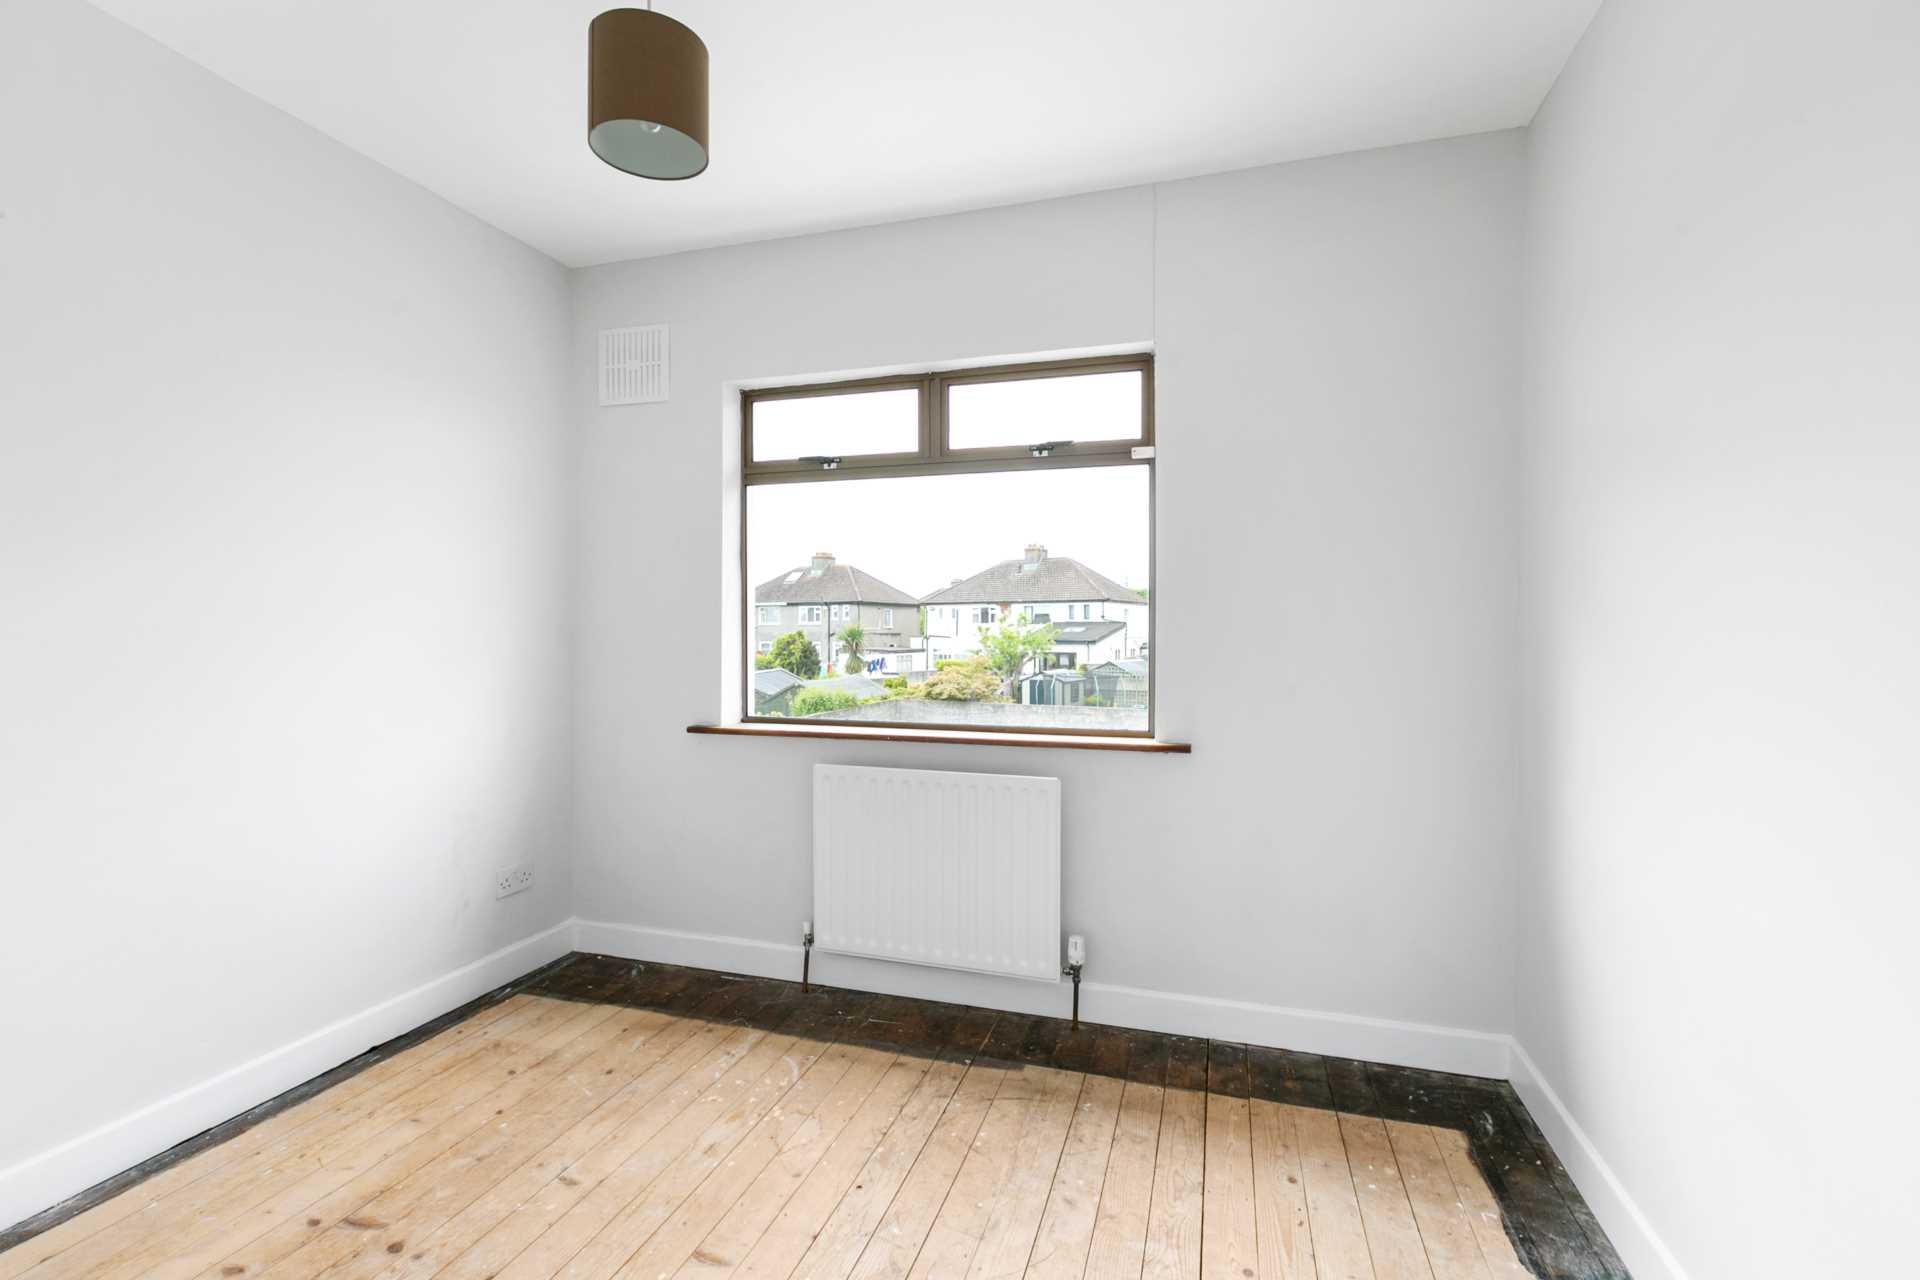 157 Whitehall Road West, Manor Estate, Terenure, Dublin 12, Image 11